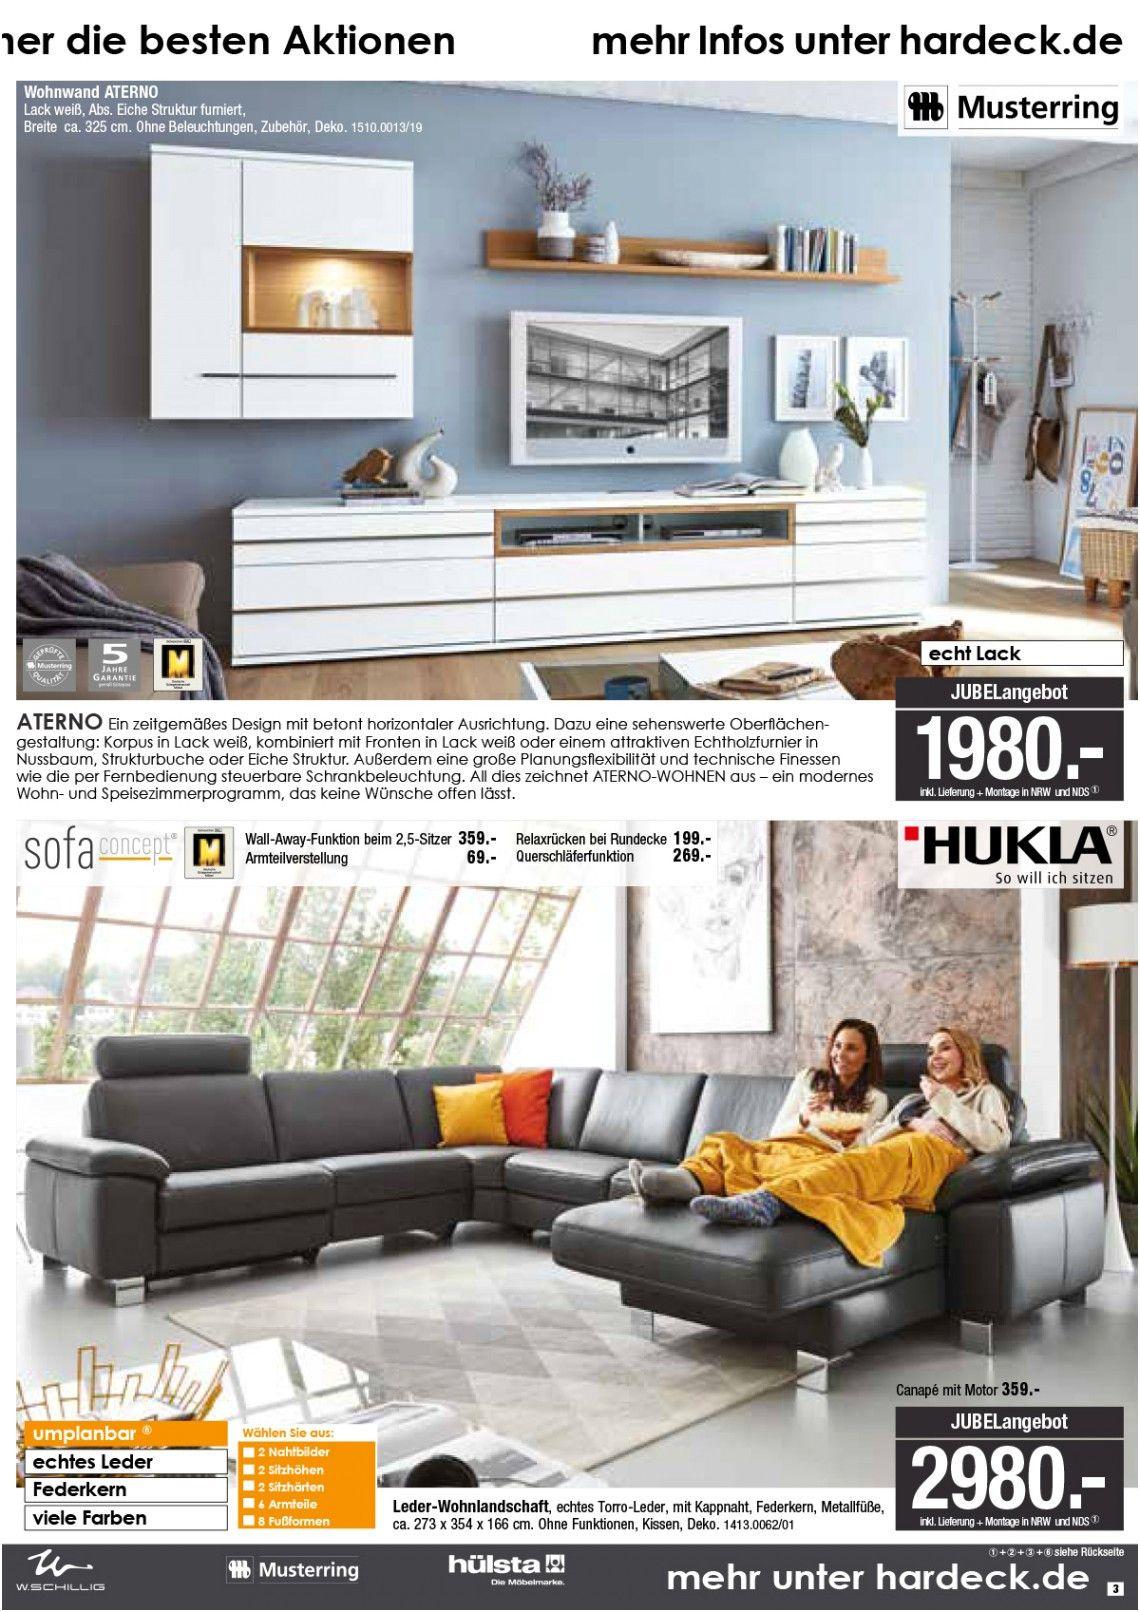 hübsch möbel hardi bochum in 2020 | bedroom design